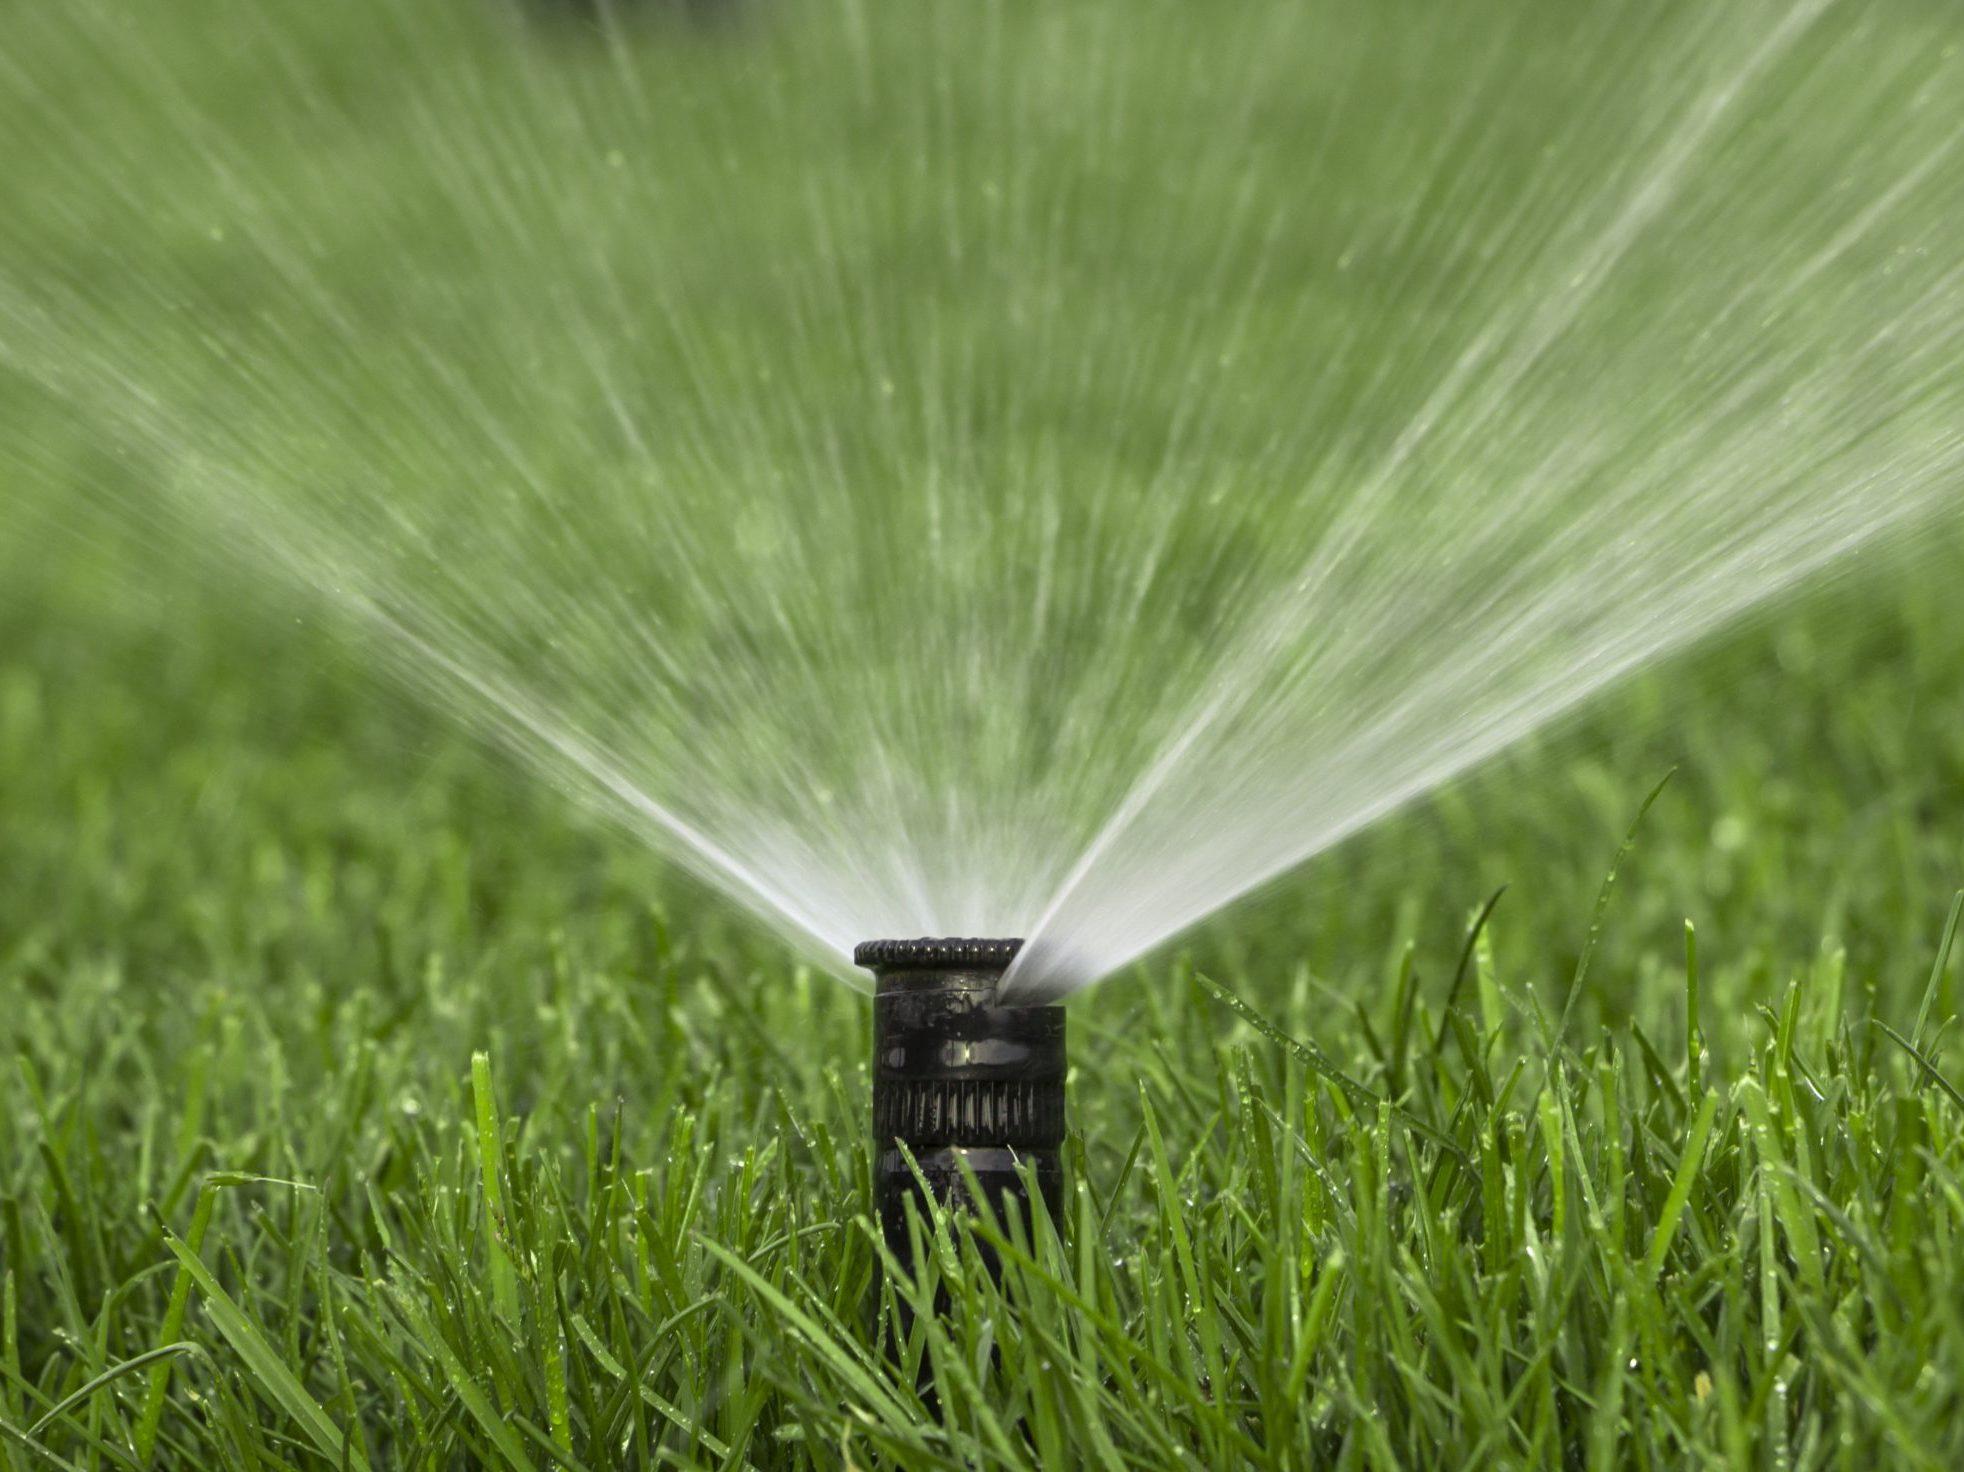 irrigation head close-up